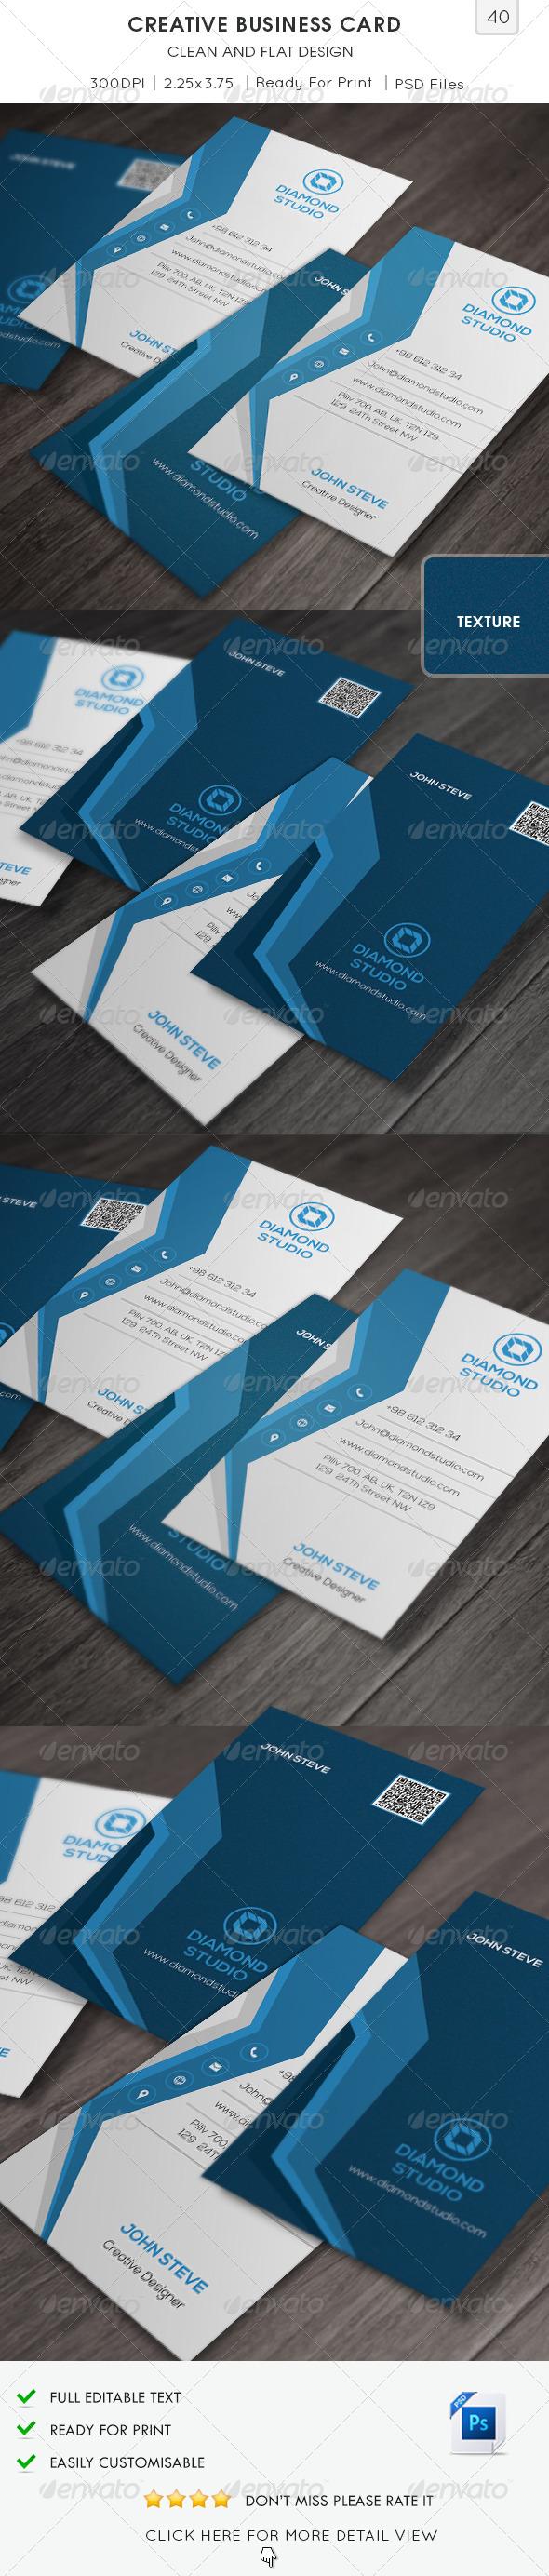 Creative Business Card v40 - Creative Business Cards